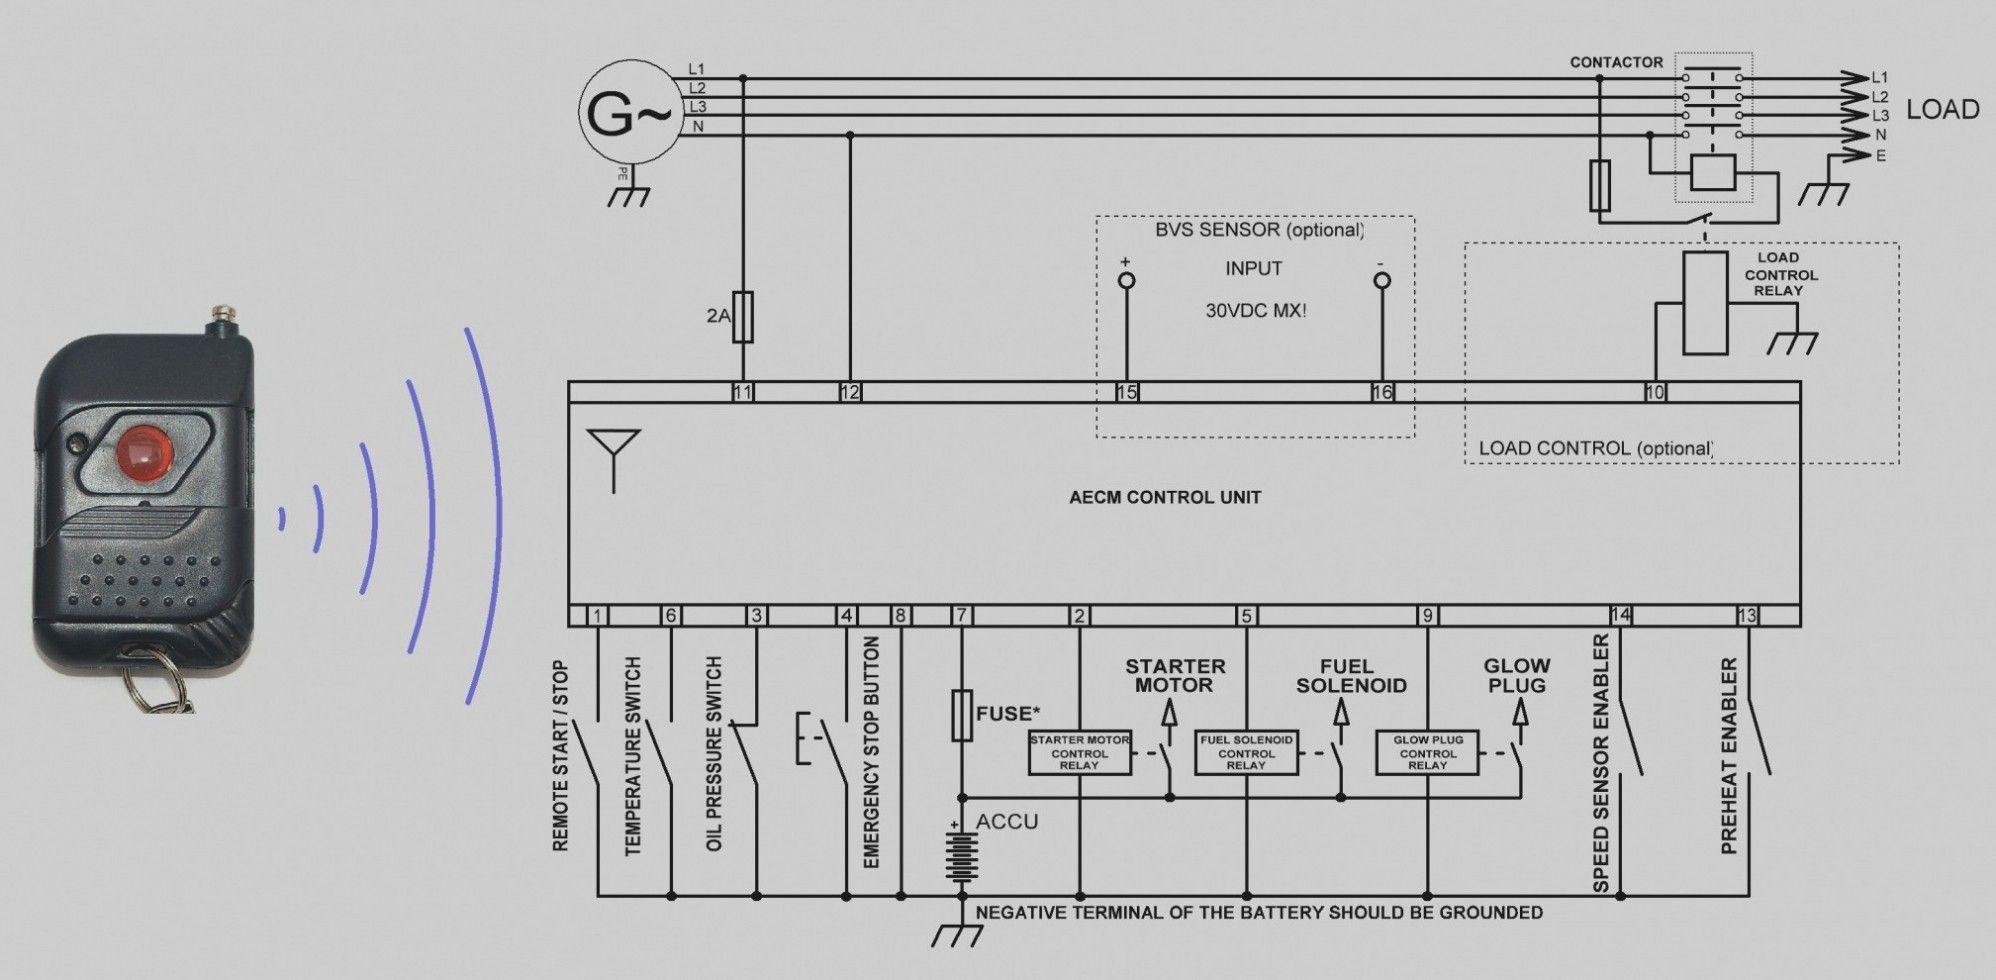 medium resolution of unique electric fan motor wiring diagram pdf diagram diagramsample diagramtemplate wiringdiagram diagramchart worksheet worksheettemplate